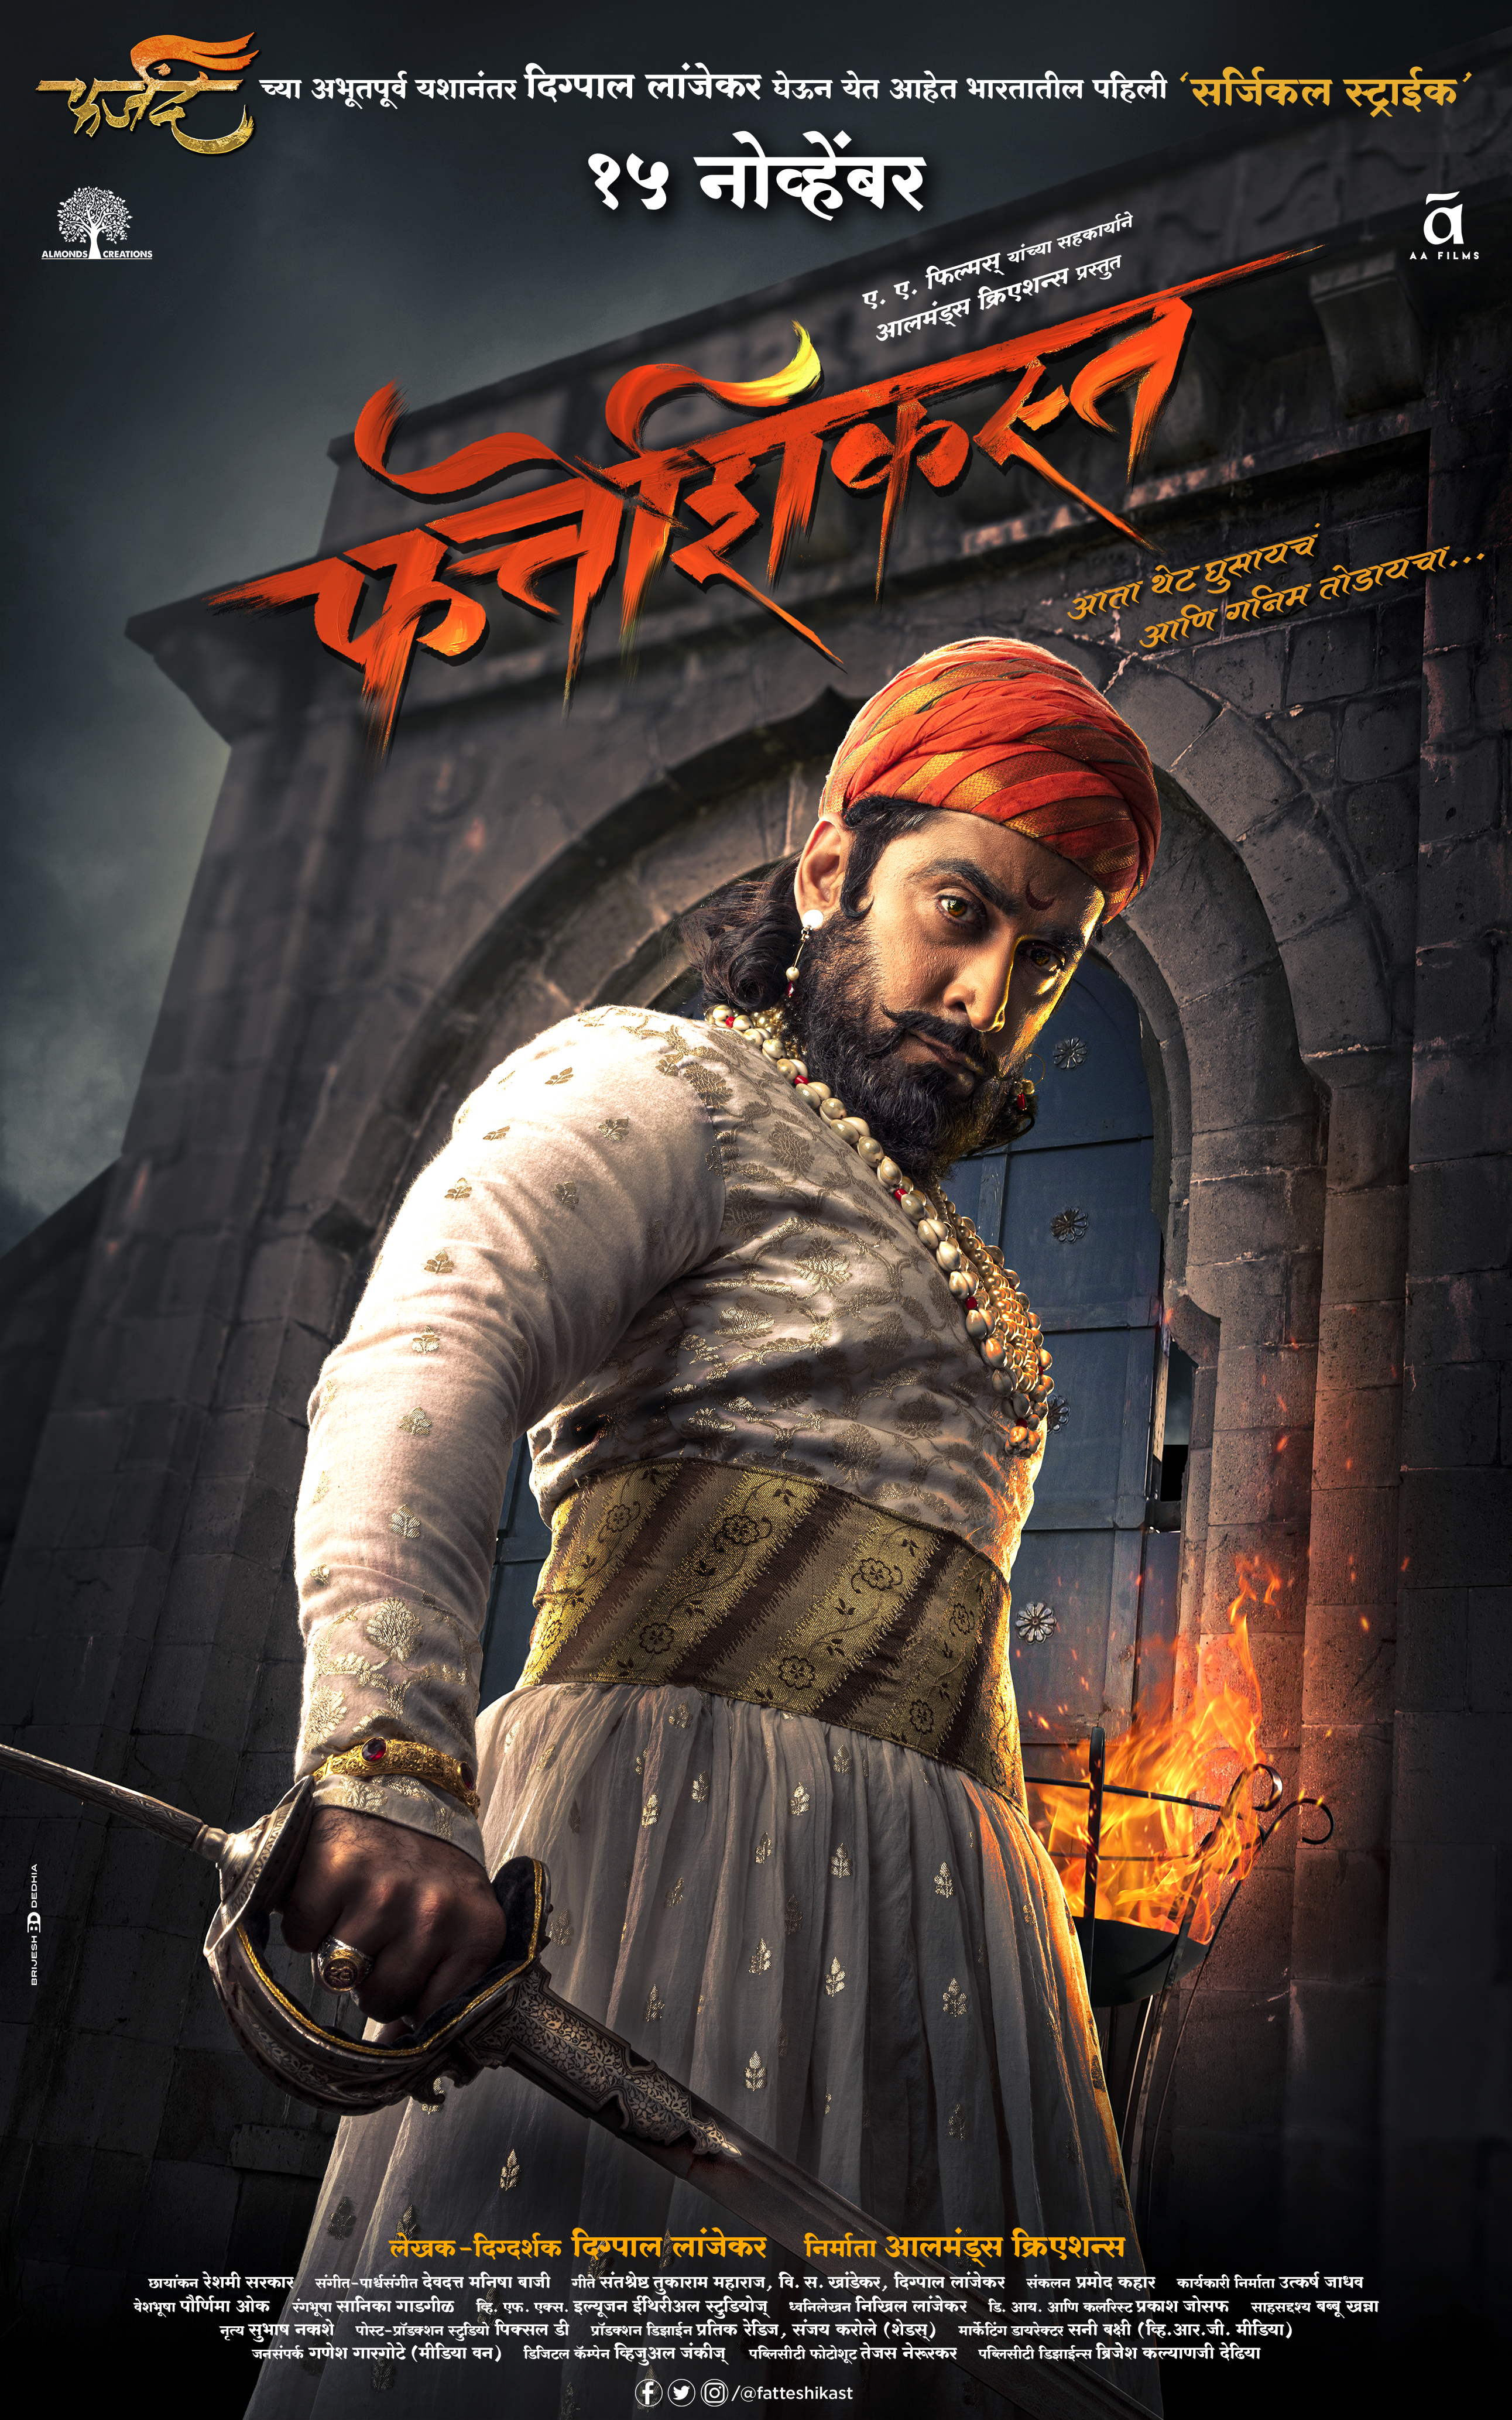 Fatteshikast 2019 Marathi Movie 450MB HDRip ESub Download